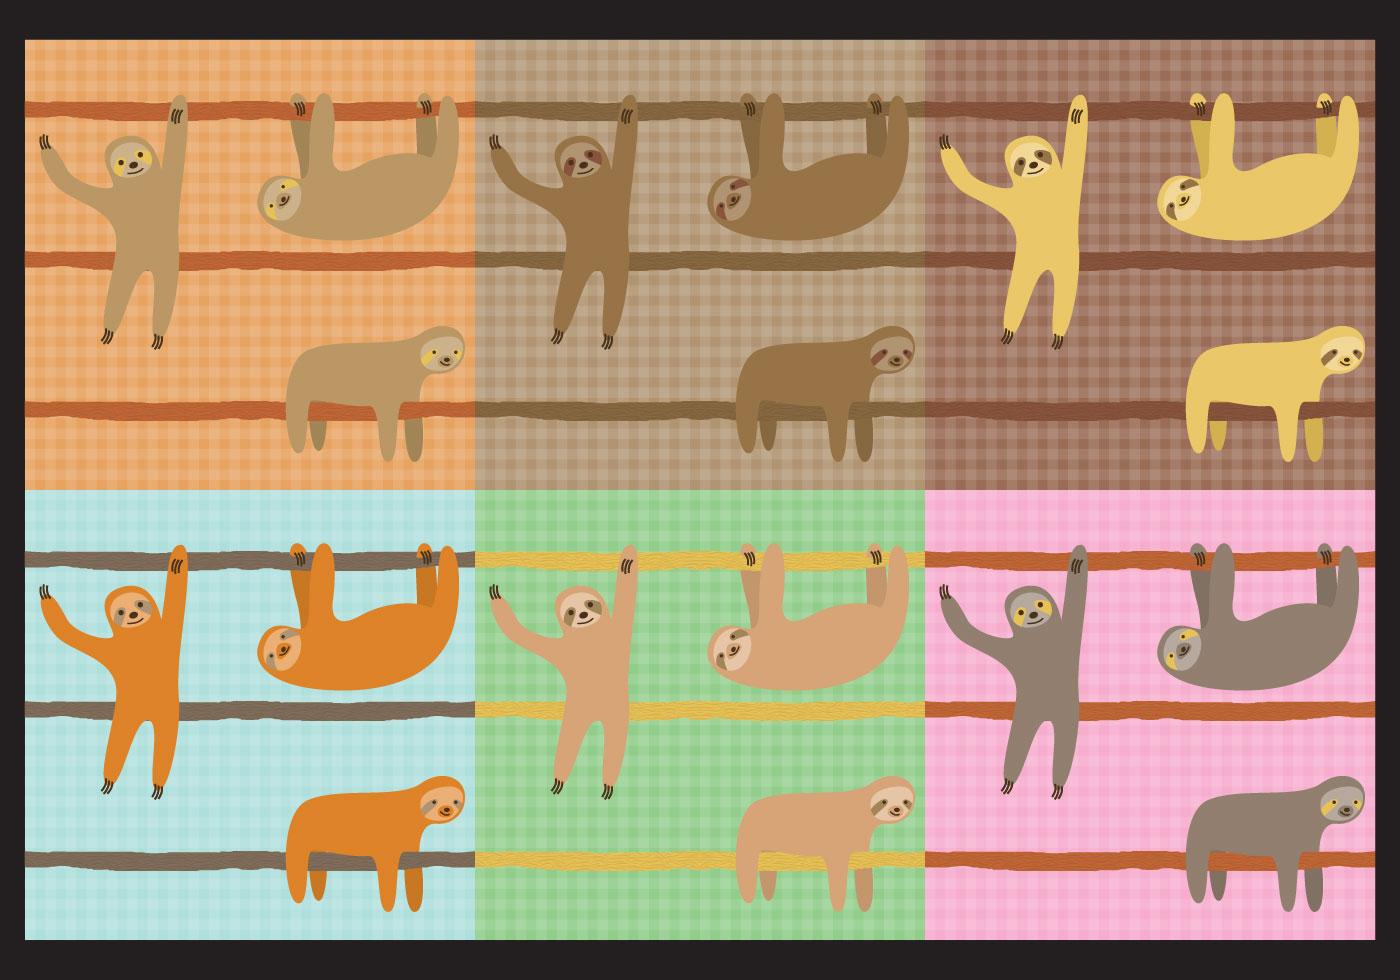 Cute Cartoon Sloth Wallpaper Sloth Patterns Download Free Vectors Clipart Graphics